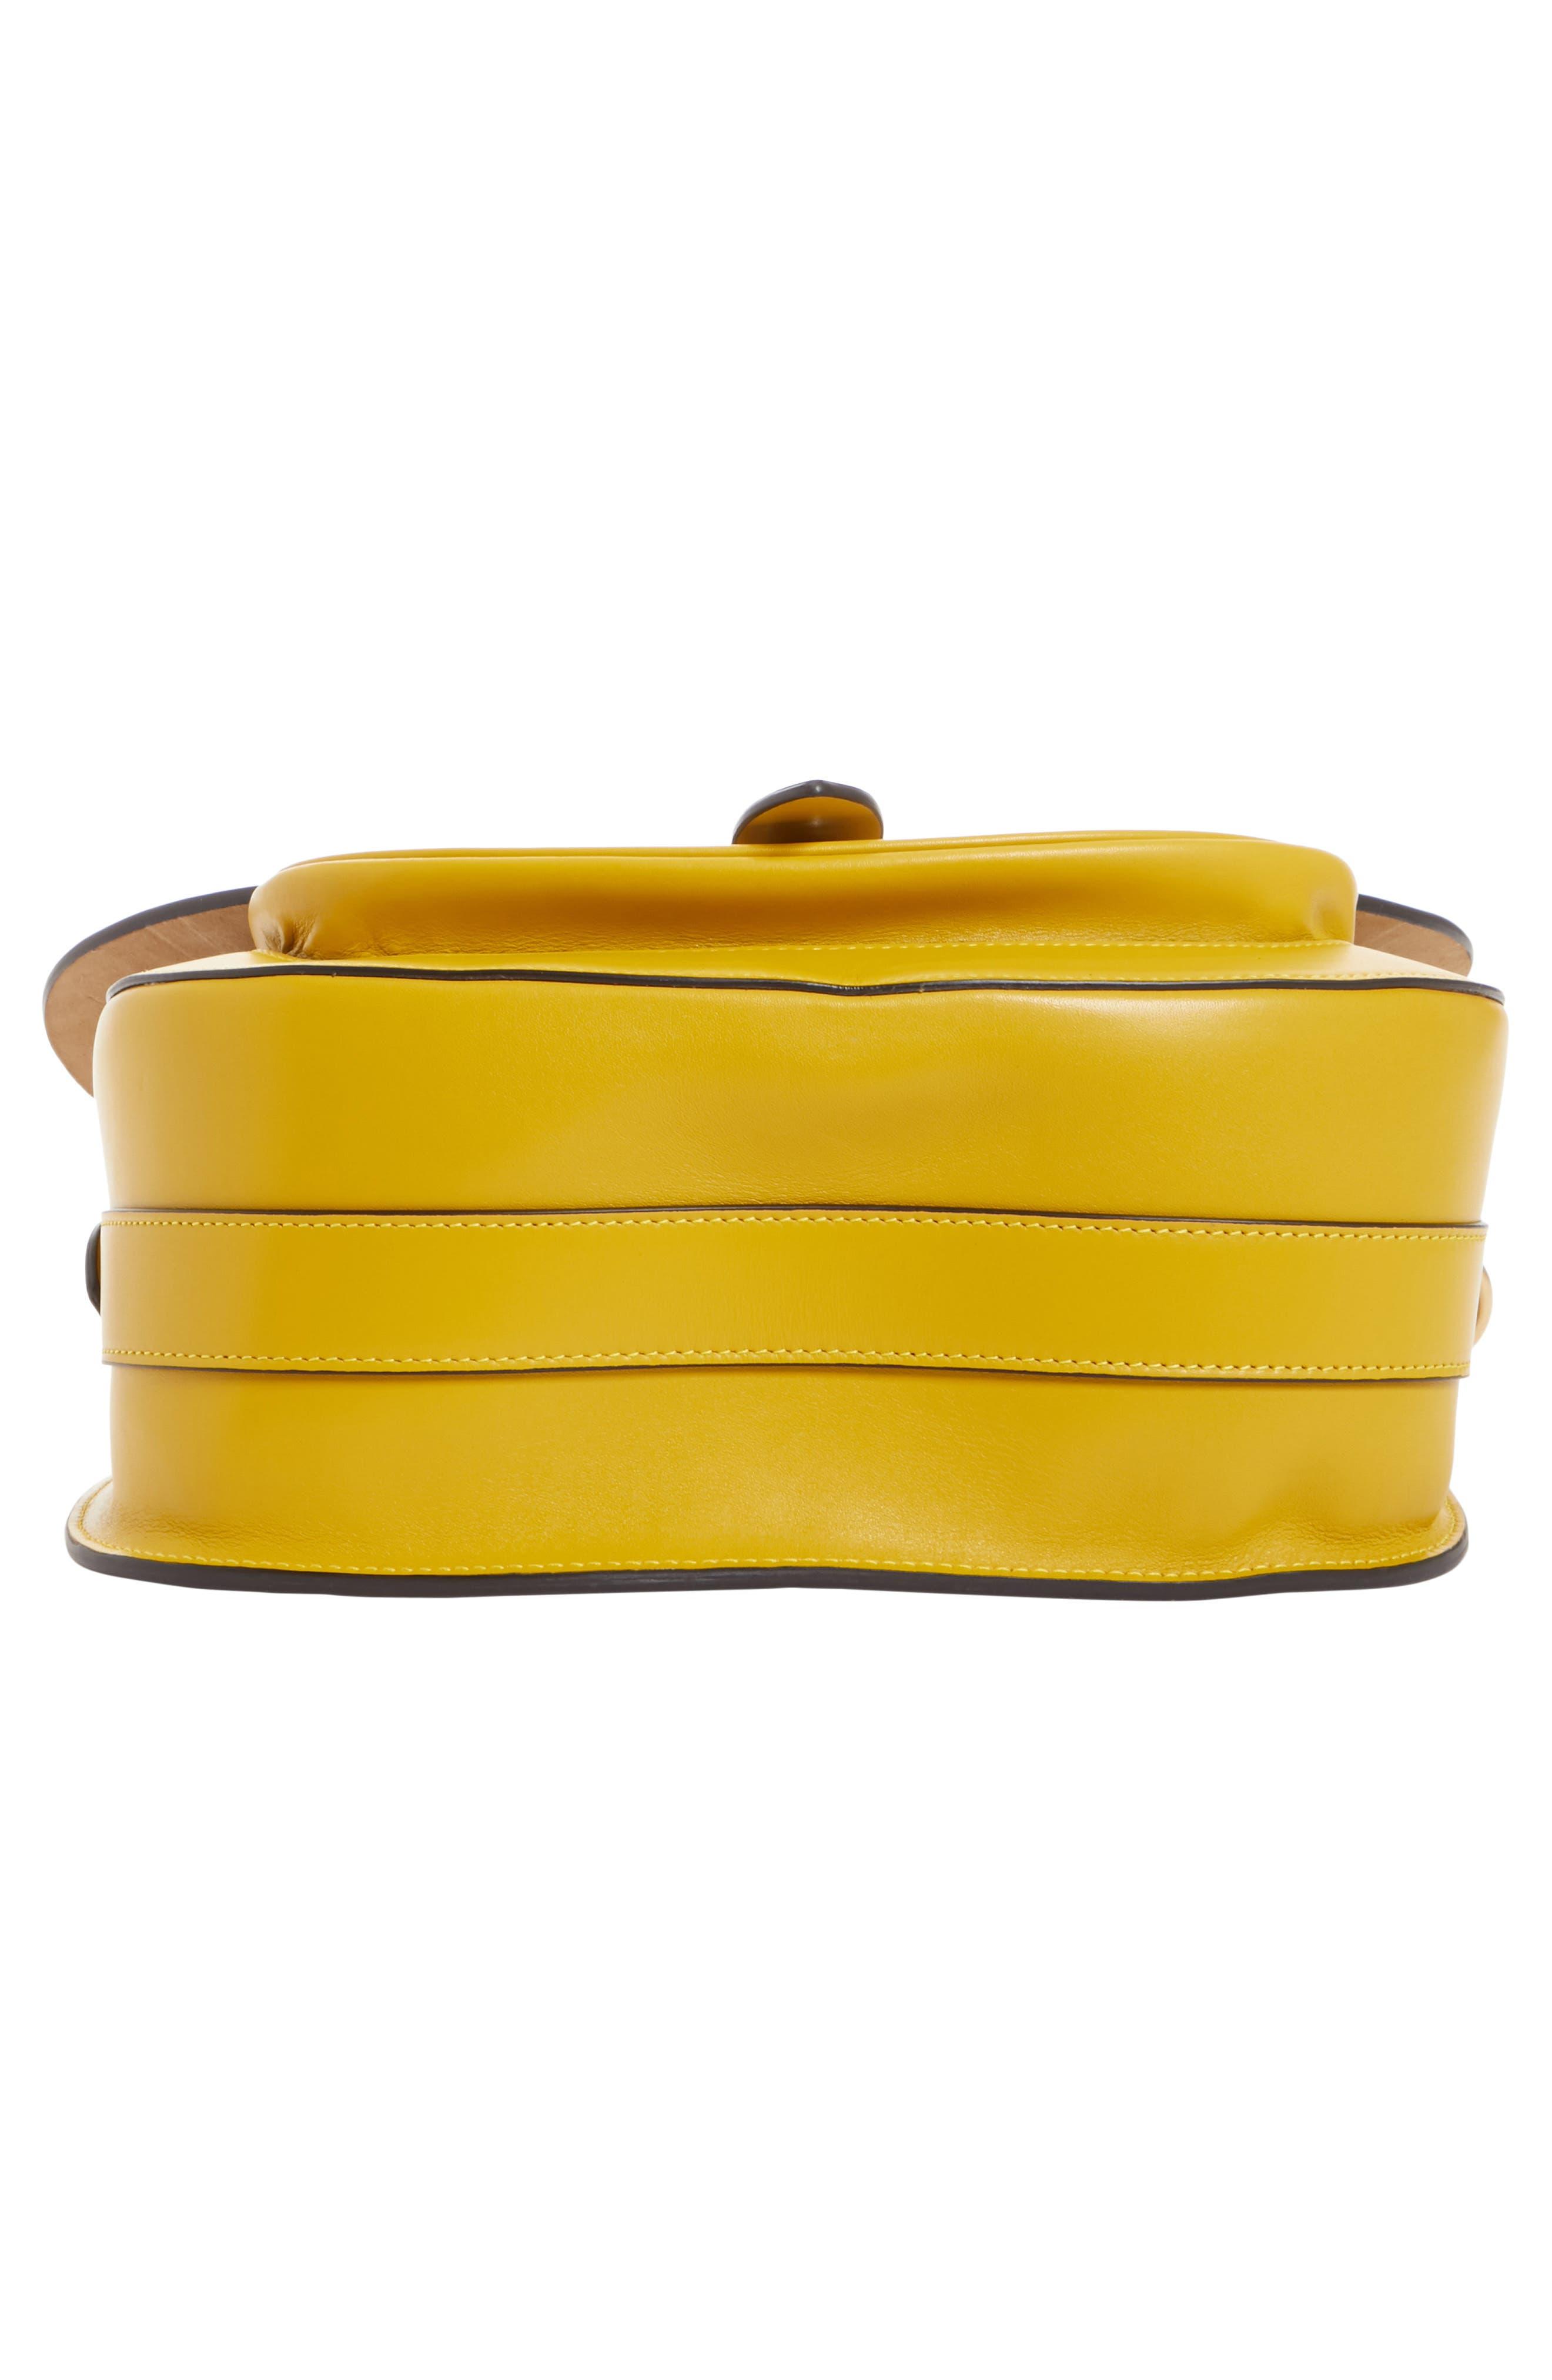 Large Bag Slide Leather Saddle Bag,                             Alternate thumbnail 6, color,                             YELLOW